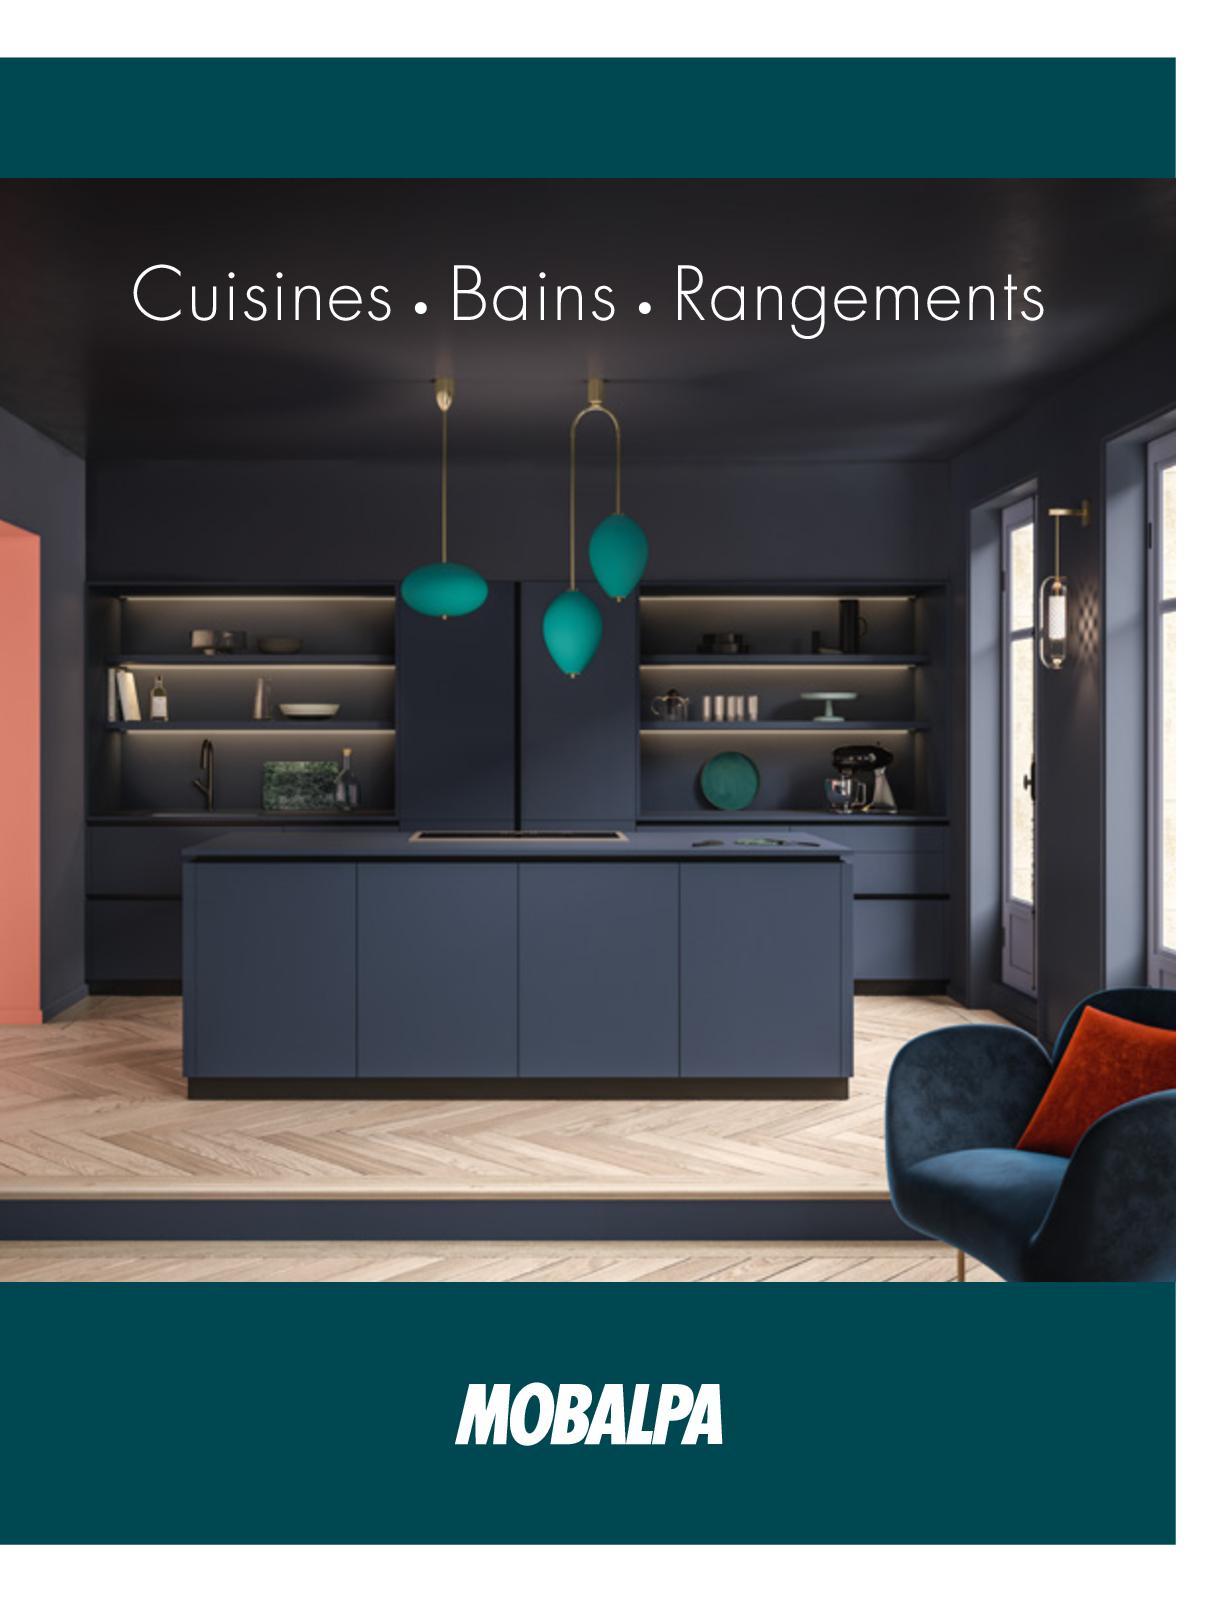 Cuisine Low Cost Mobalpa mobalpa 2019 fr com 72 - calameo downloader